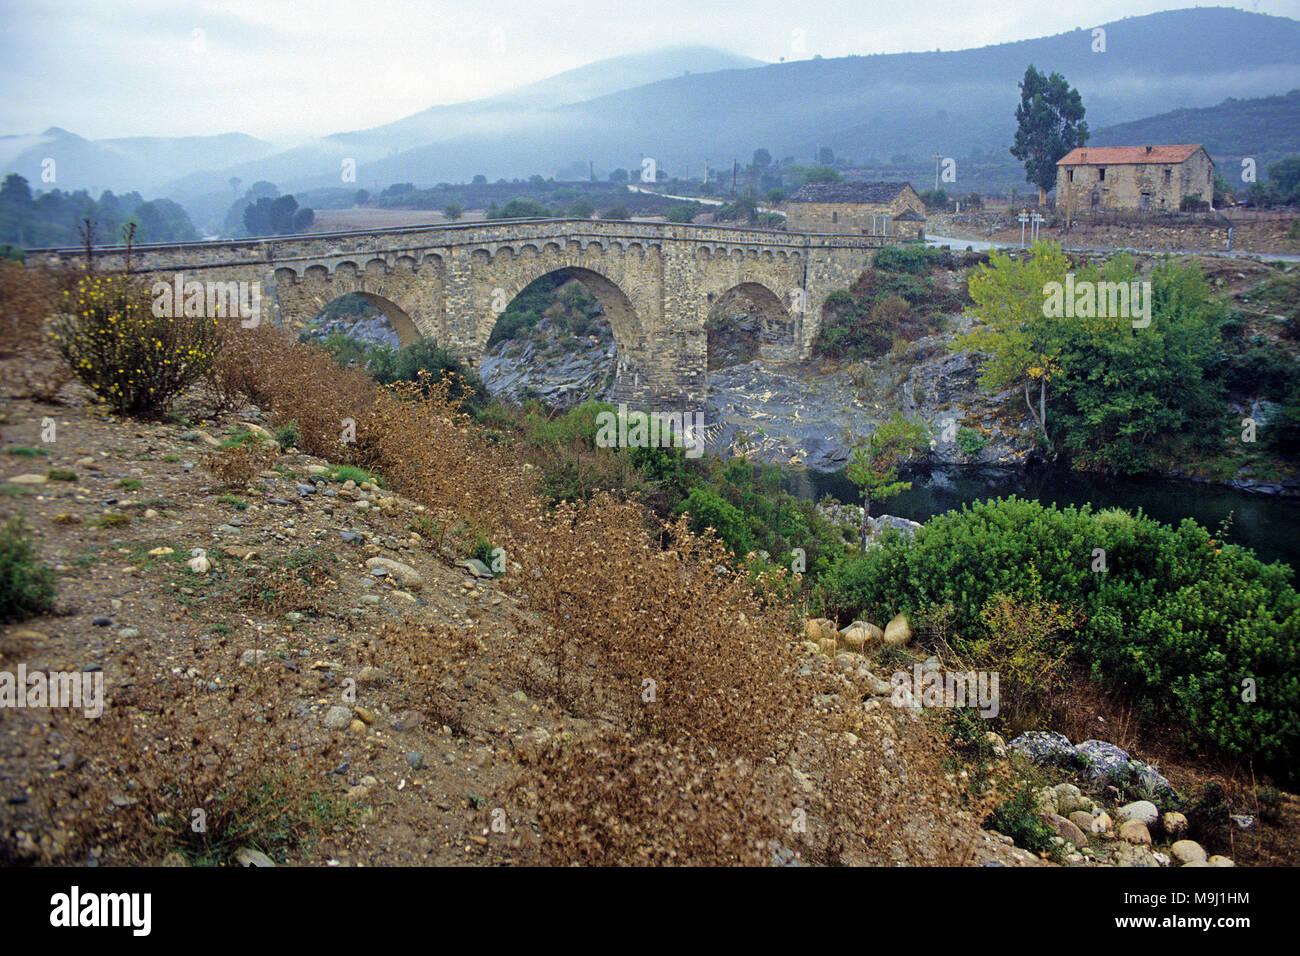 Old genoese stone bridge over the Tavignano river, Calacuccia, Corsica, France, Mediterranean, Europe - Stock Image